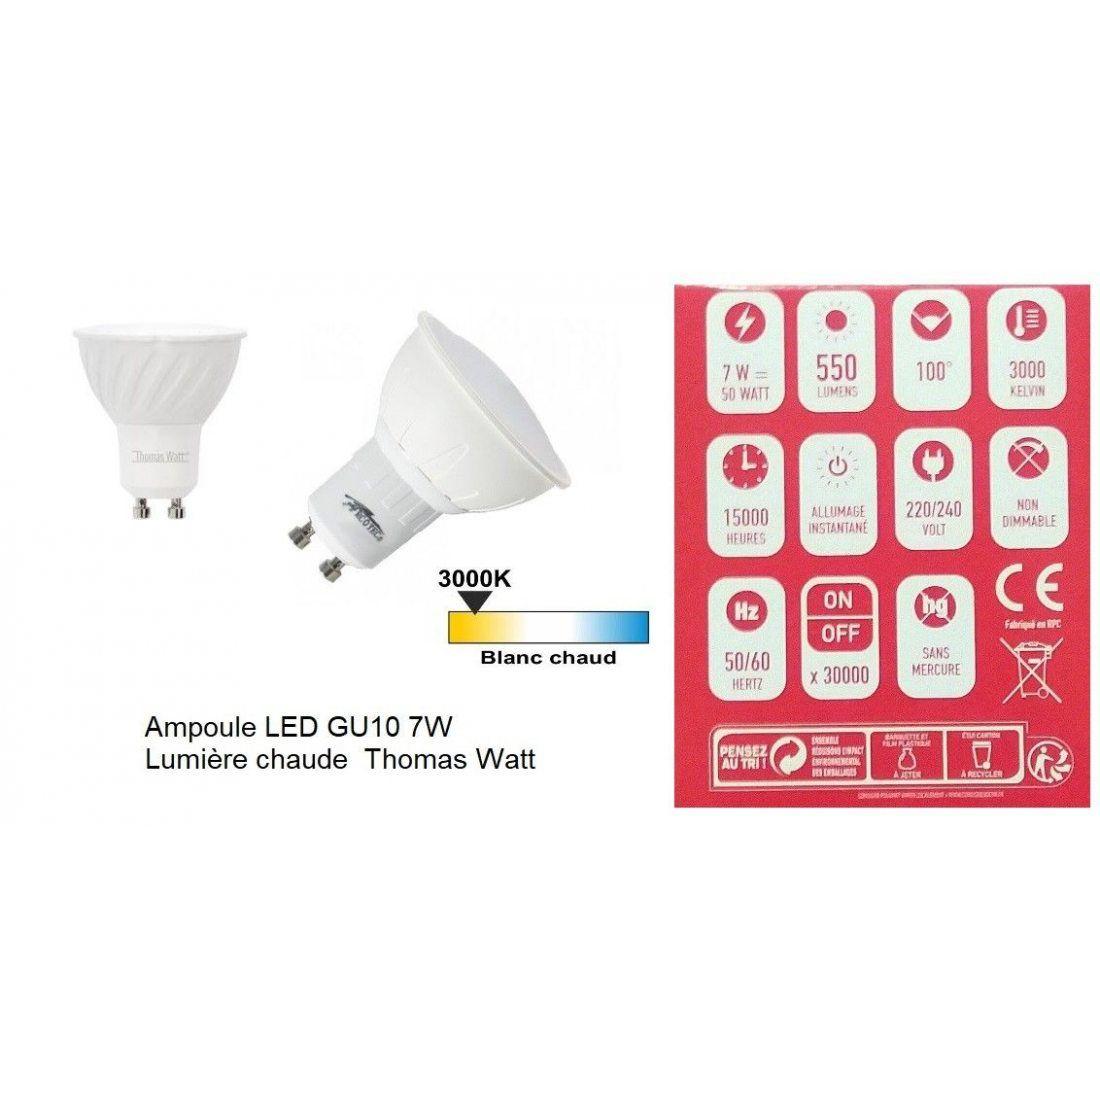 gu10 led lot de 2 ampoules 7w lumi re chaude thomas watt. Black Bedroom Furniture Sets. Home Design Ideas